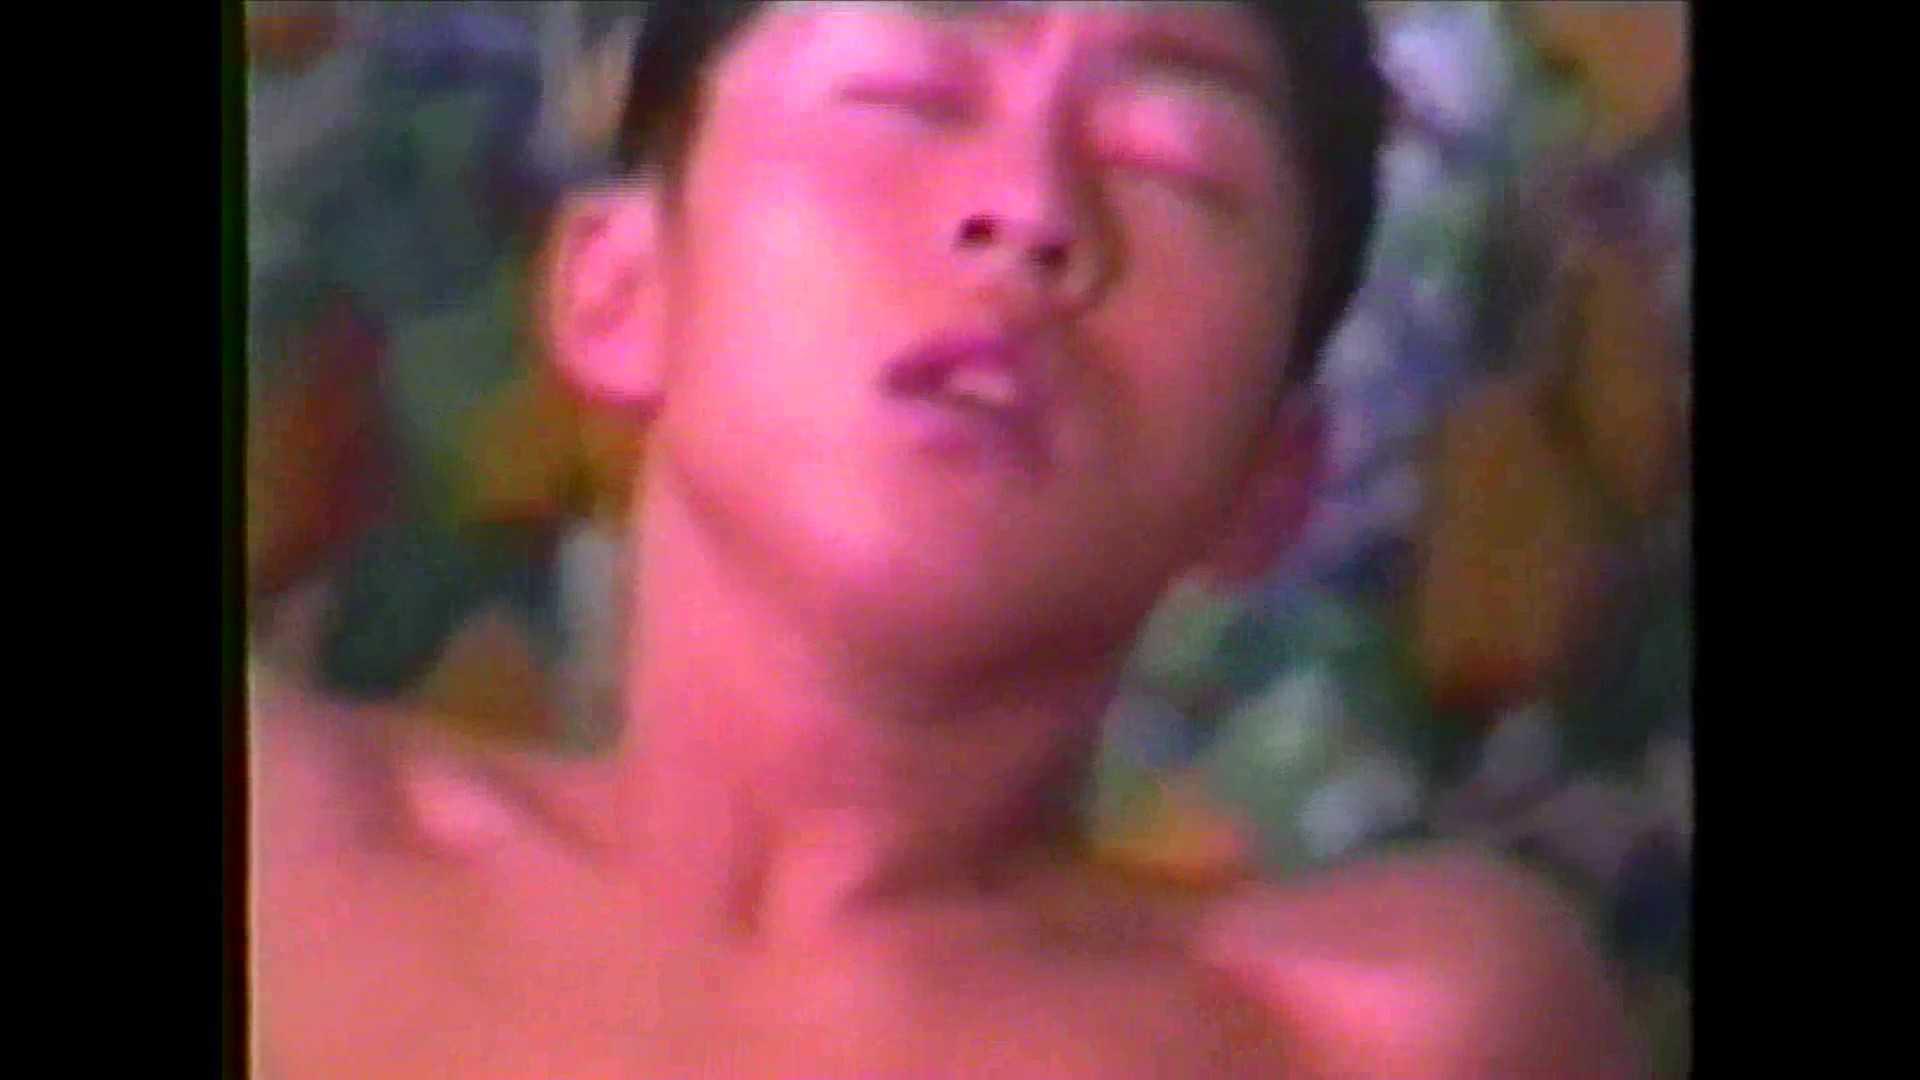 GAYBOY宏のオカズ倉庫Vol.12-2 シックスナイン69 | 風呂天国 ゲイヌード画像 99枚 72